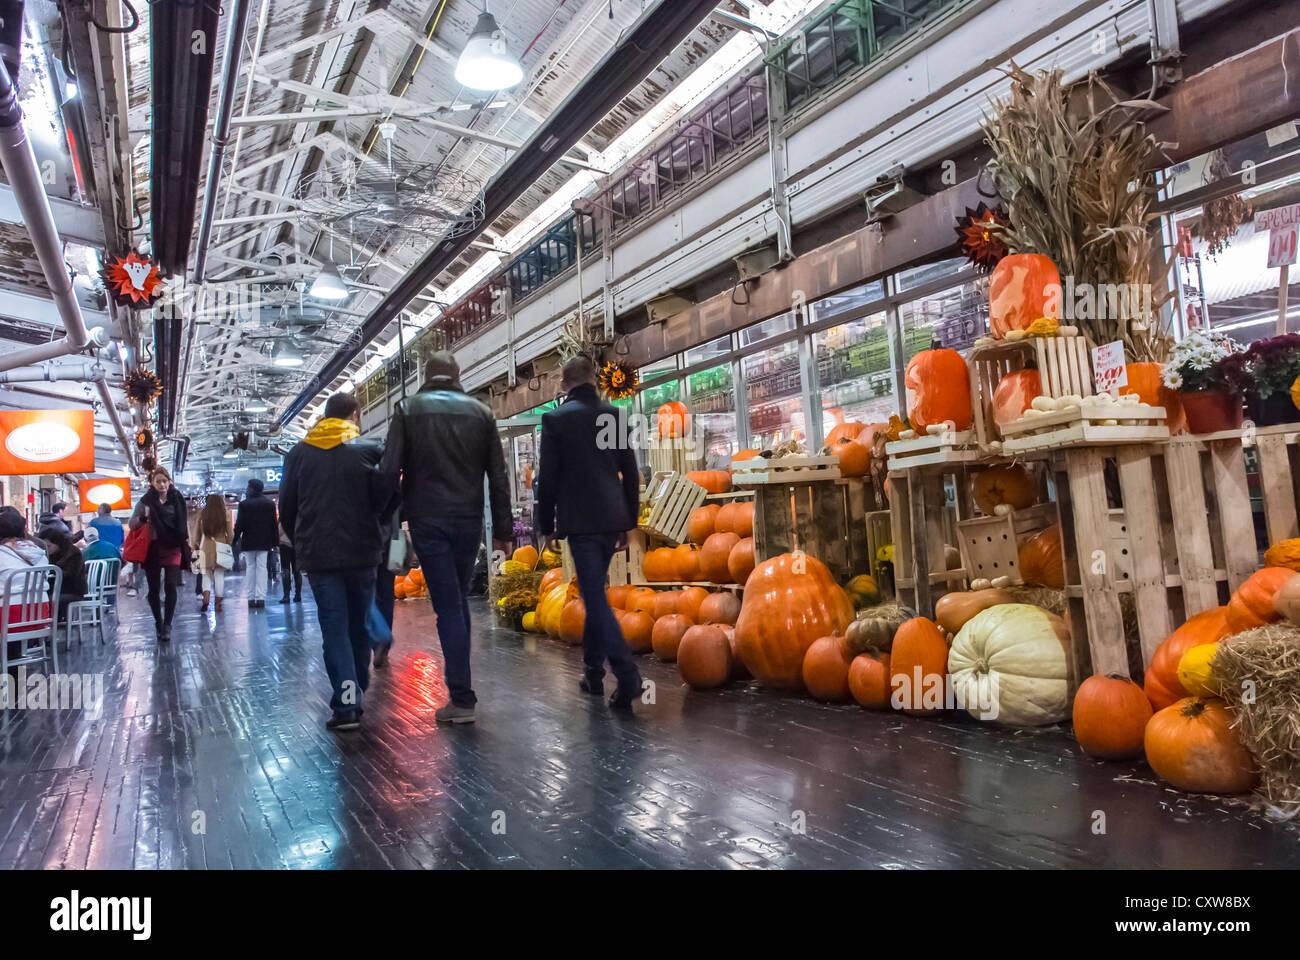 Chelsea Market new york city, ny, usa, people shopping in the chelsea market